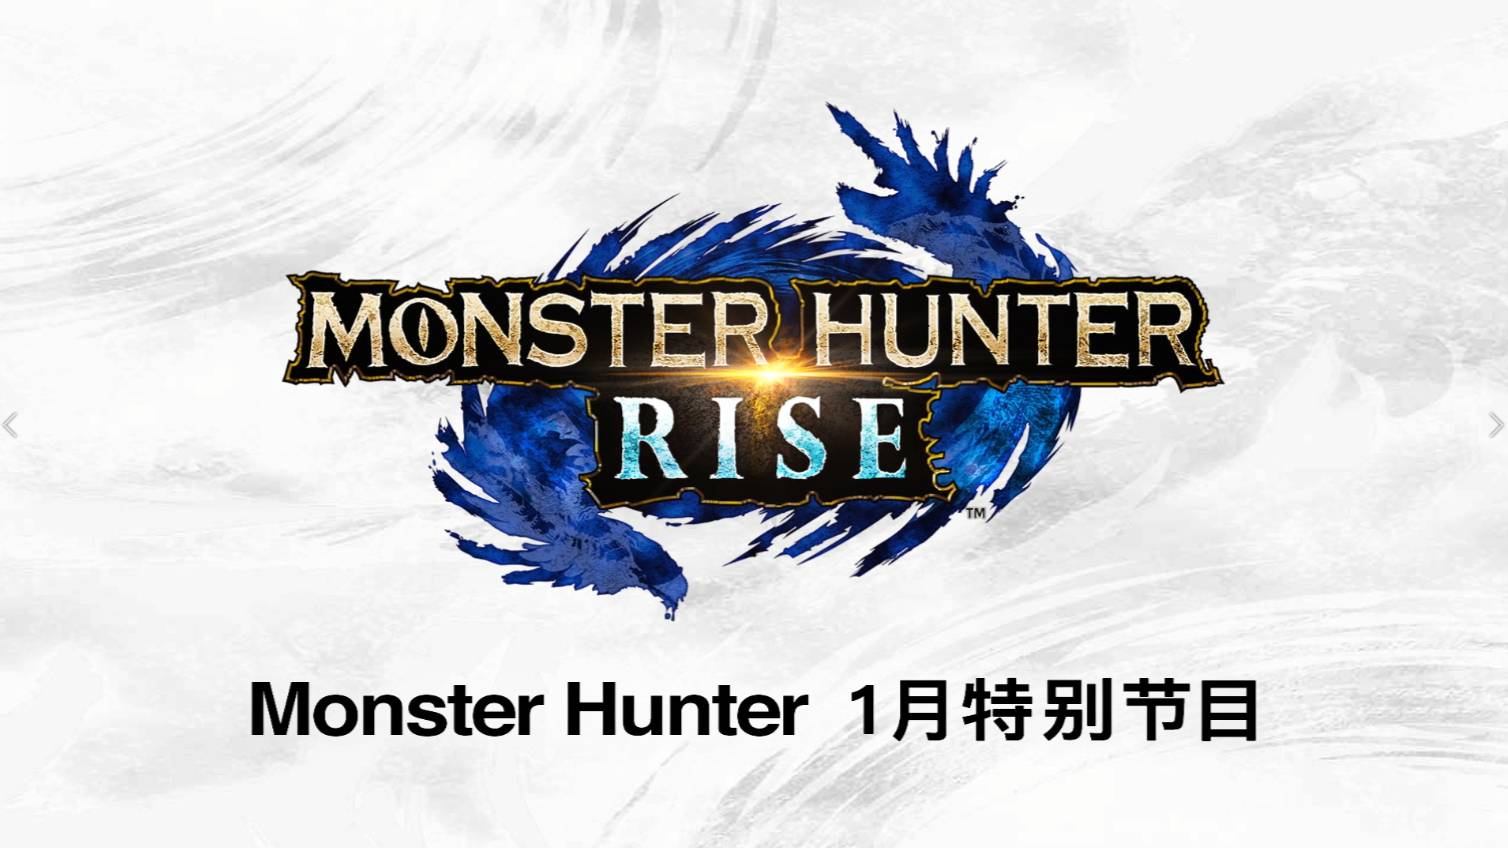 《Monster Hunter 1月特别节目》公开!进一步了解RISE的最新情报及体验版内容